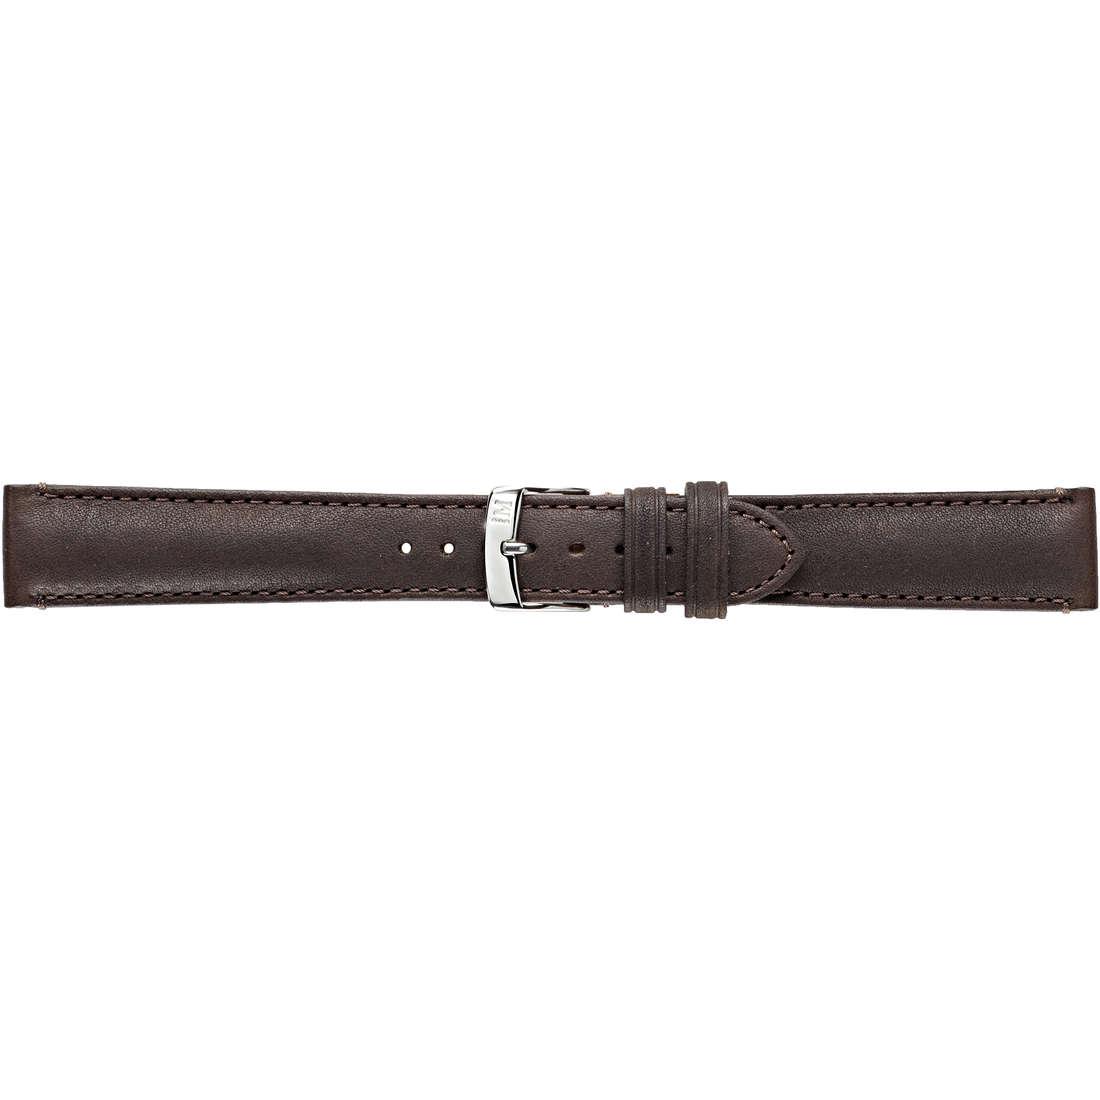 watch watch bands watch straps man Morellato Manufatti A01U3884A61030CR20